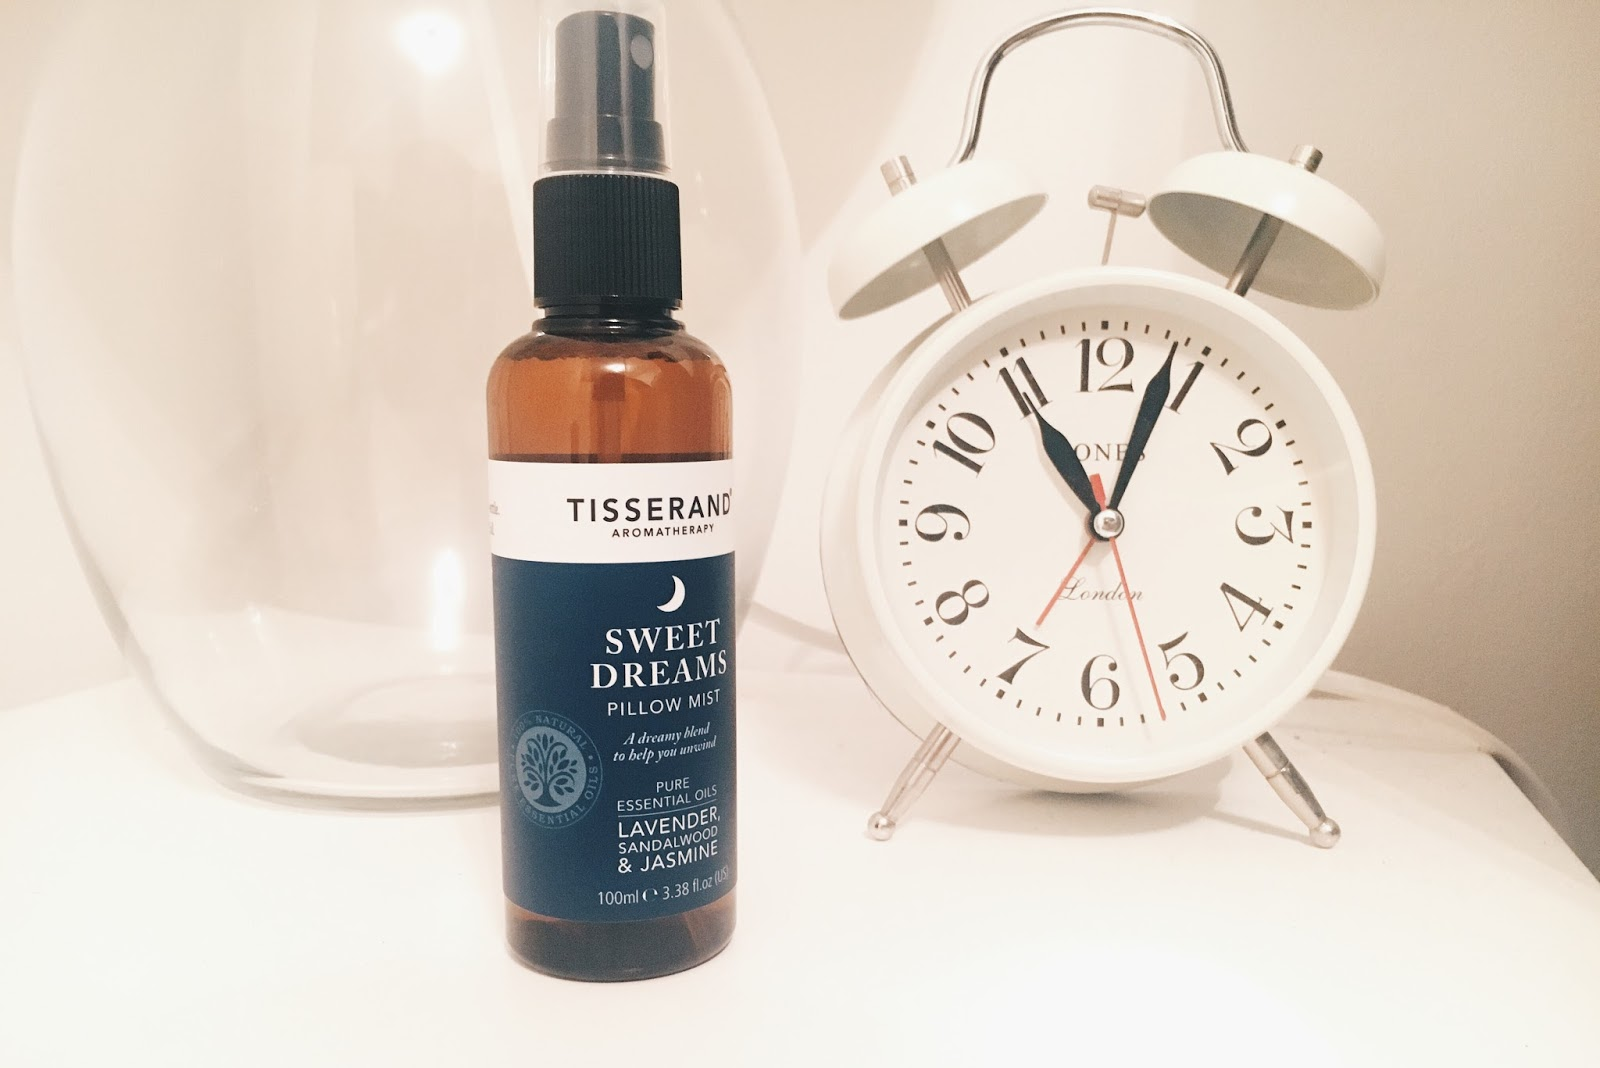 tisserand pillow spray lavender jasmine sandalwood sweet dreams get more sleep